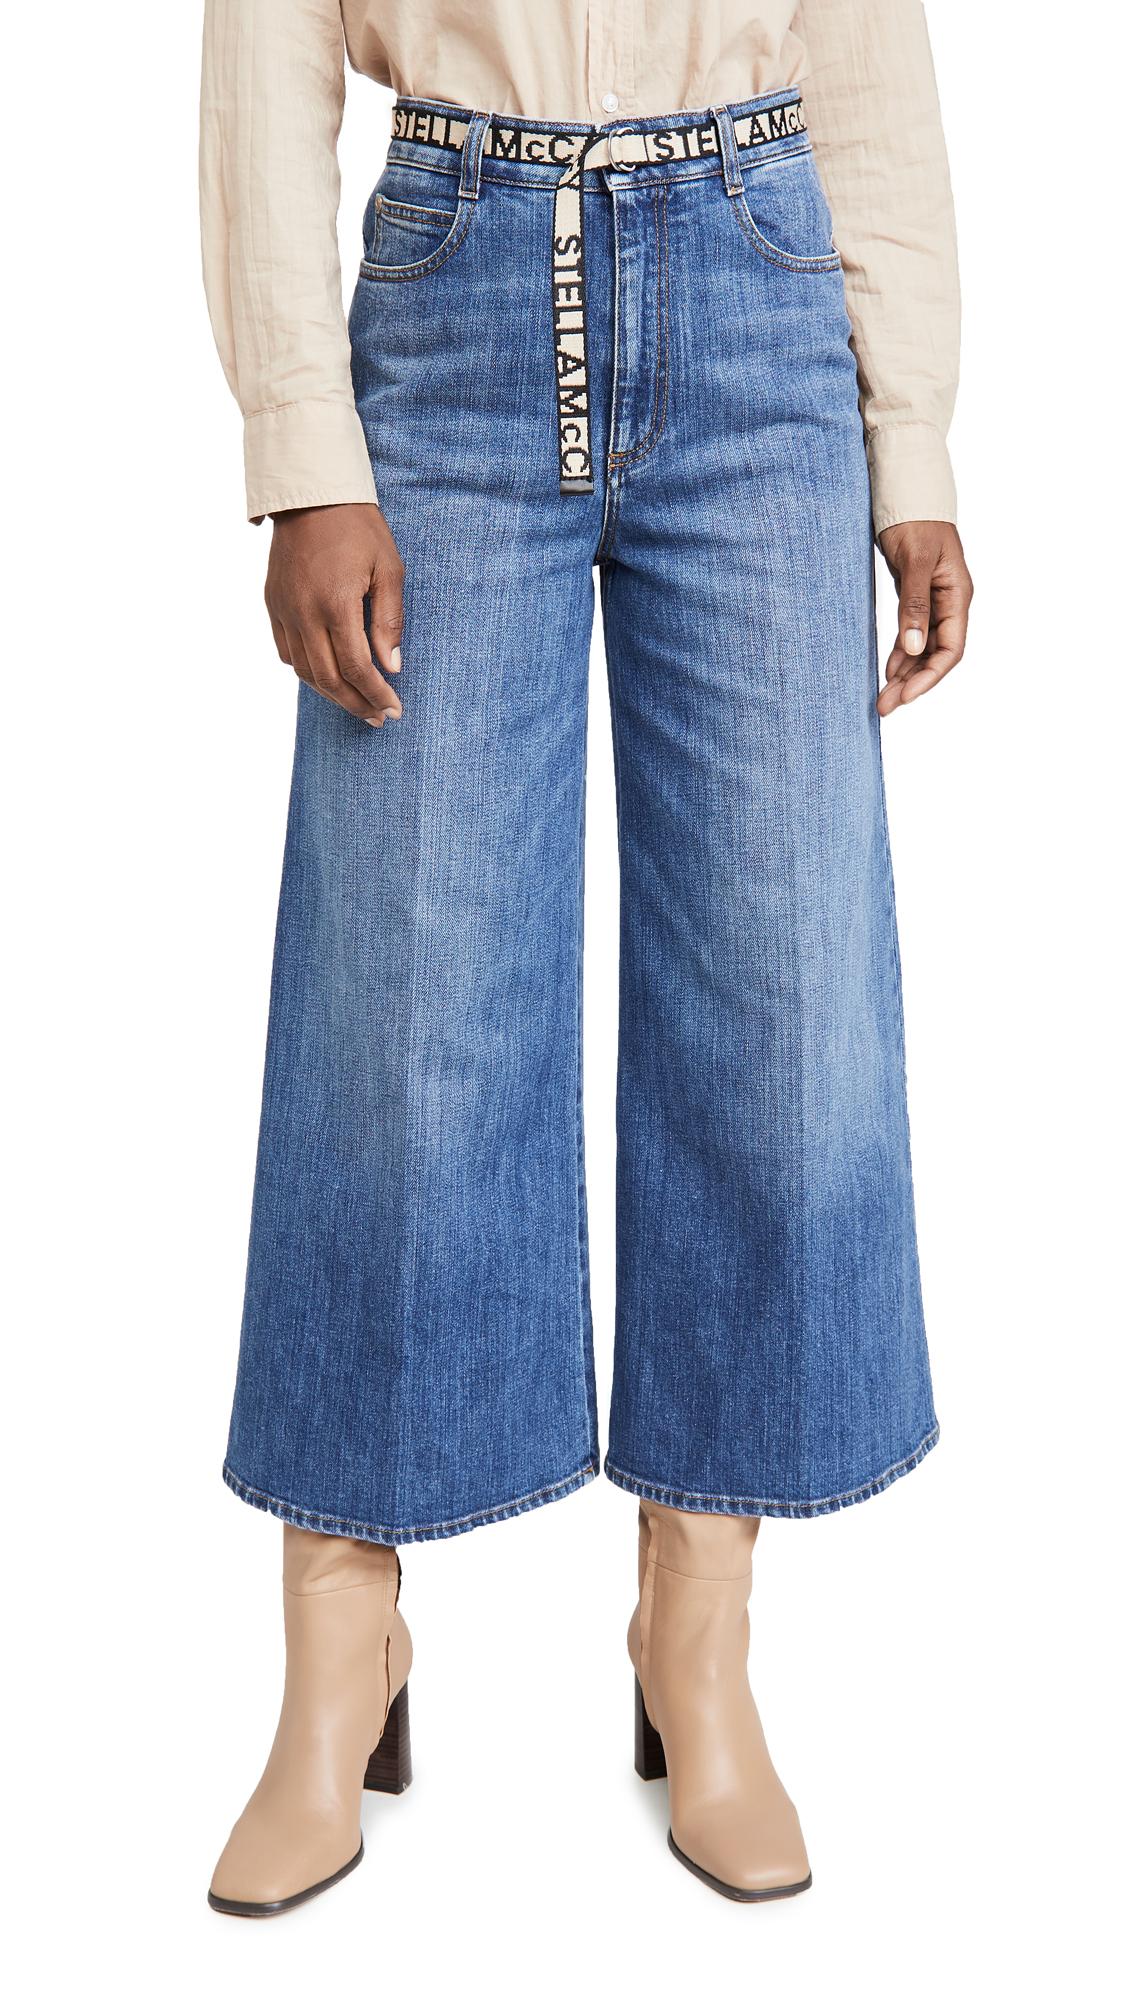 Stella McCartney High Rise Wide Leg Ecodark Stone Blue Jeans